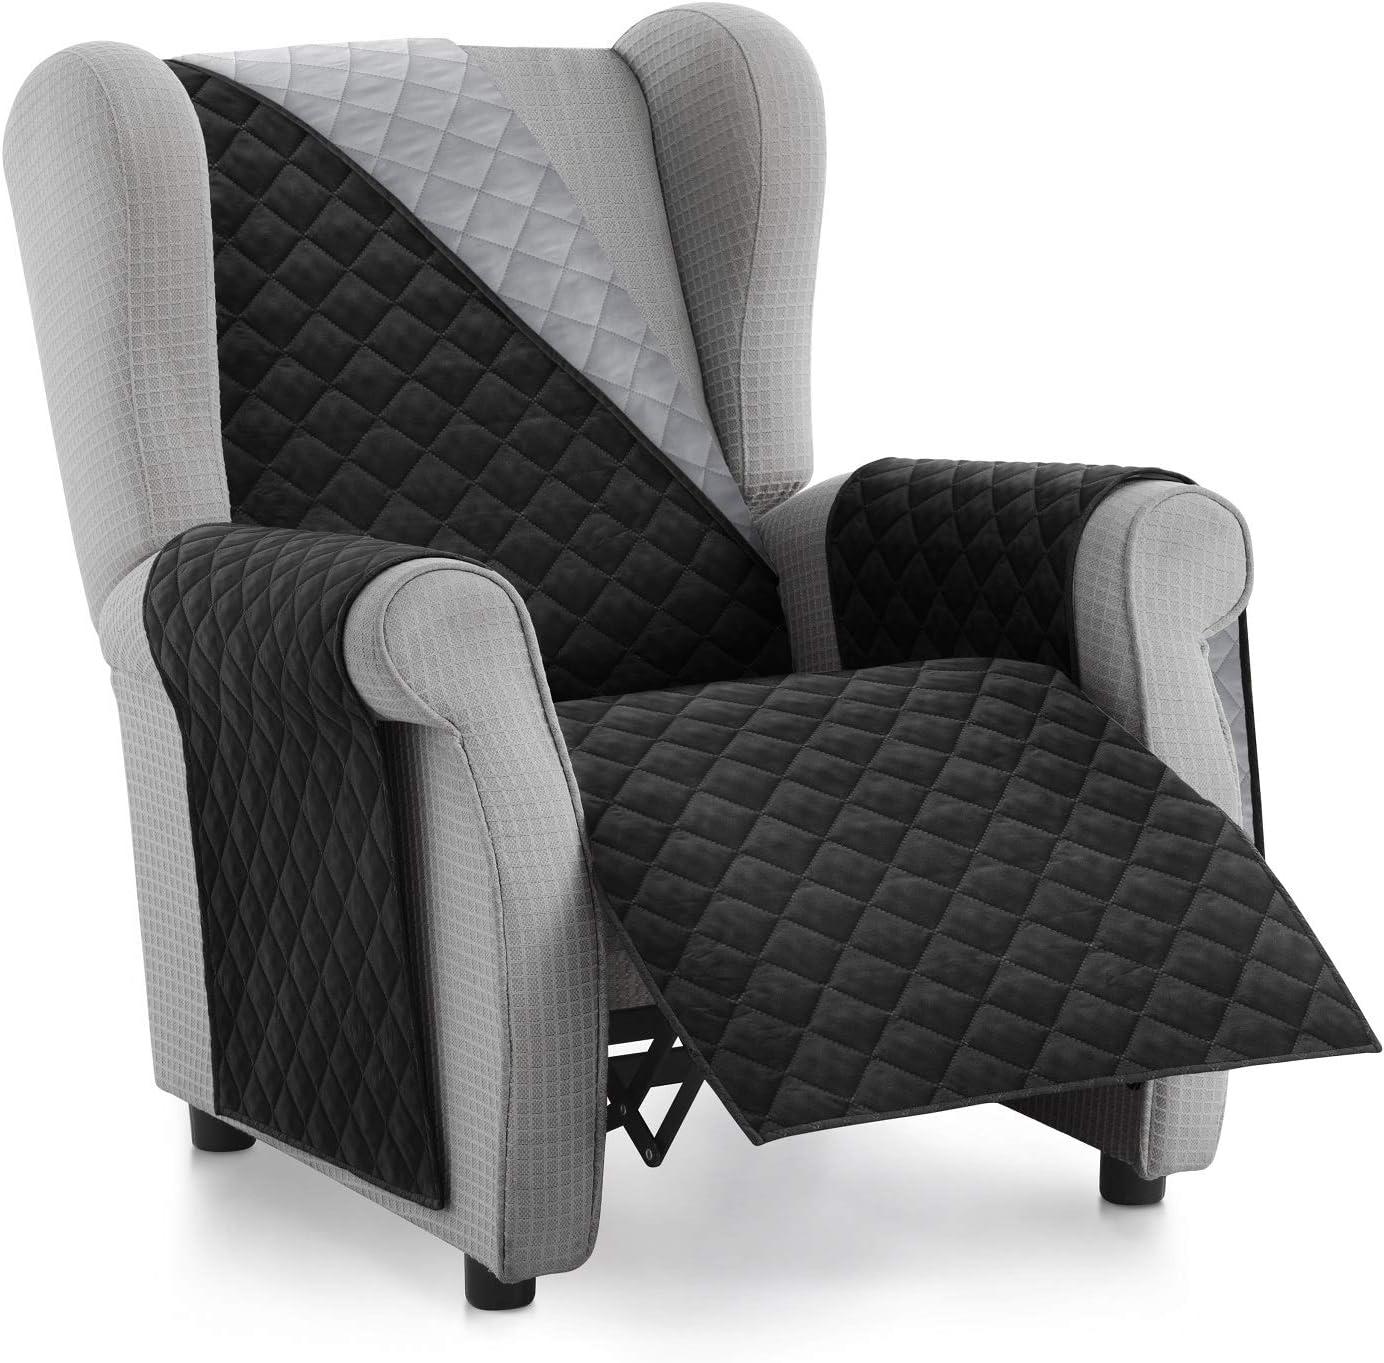 Textilhome - Funda Cubre Sofá Malu -1 Plaza - Relax - Protector para Sofás Acolchado Reversible. Color Negro